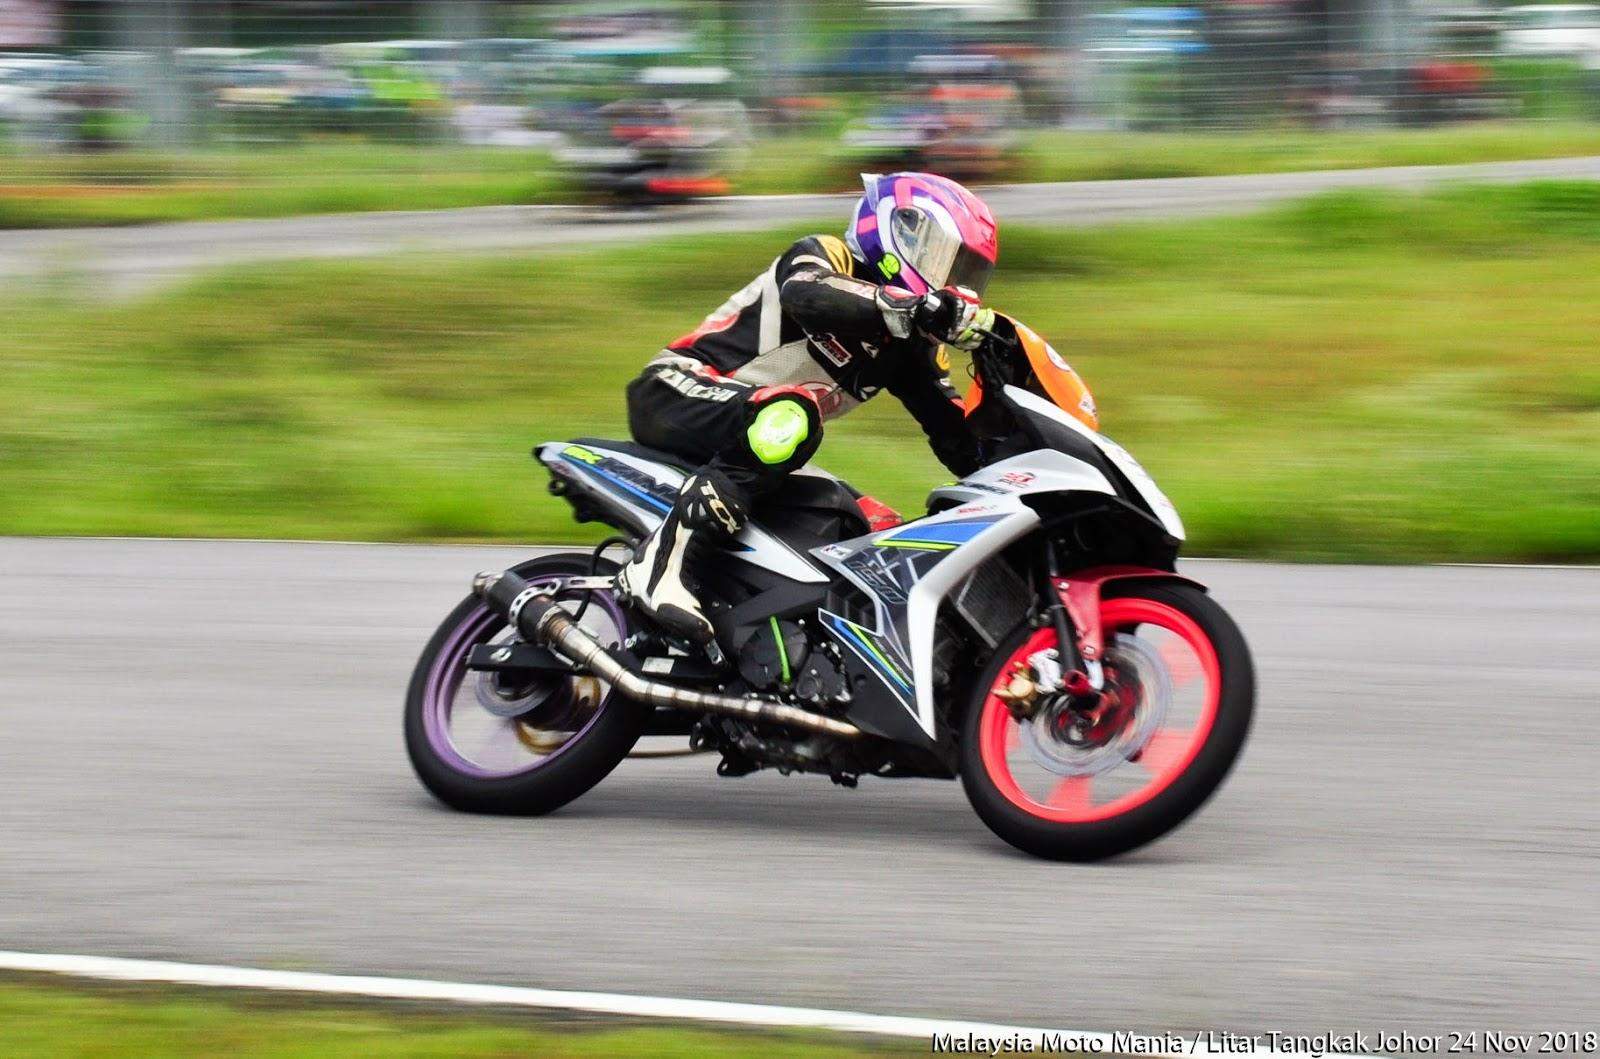 REDSPEED MOTORSPORT KUALA LUMPUR